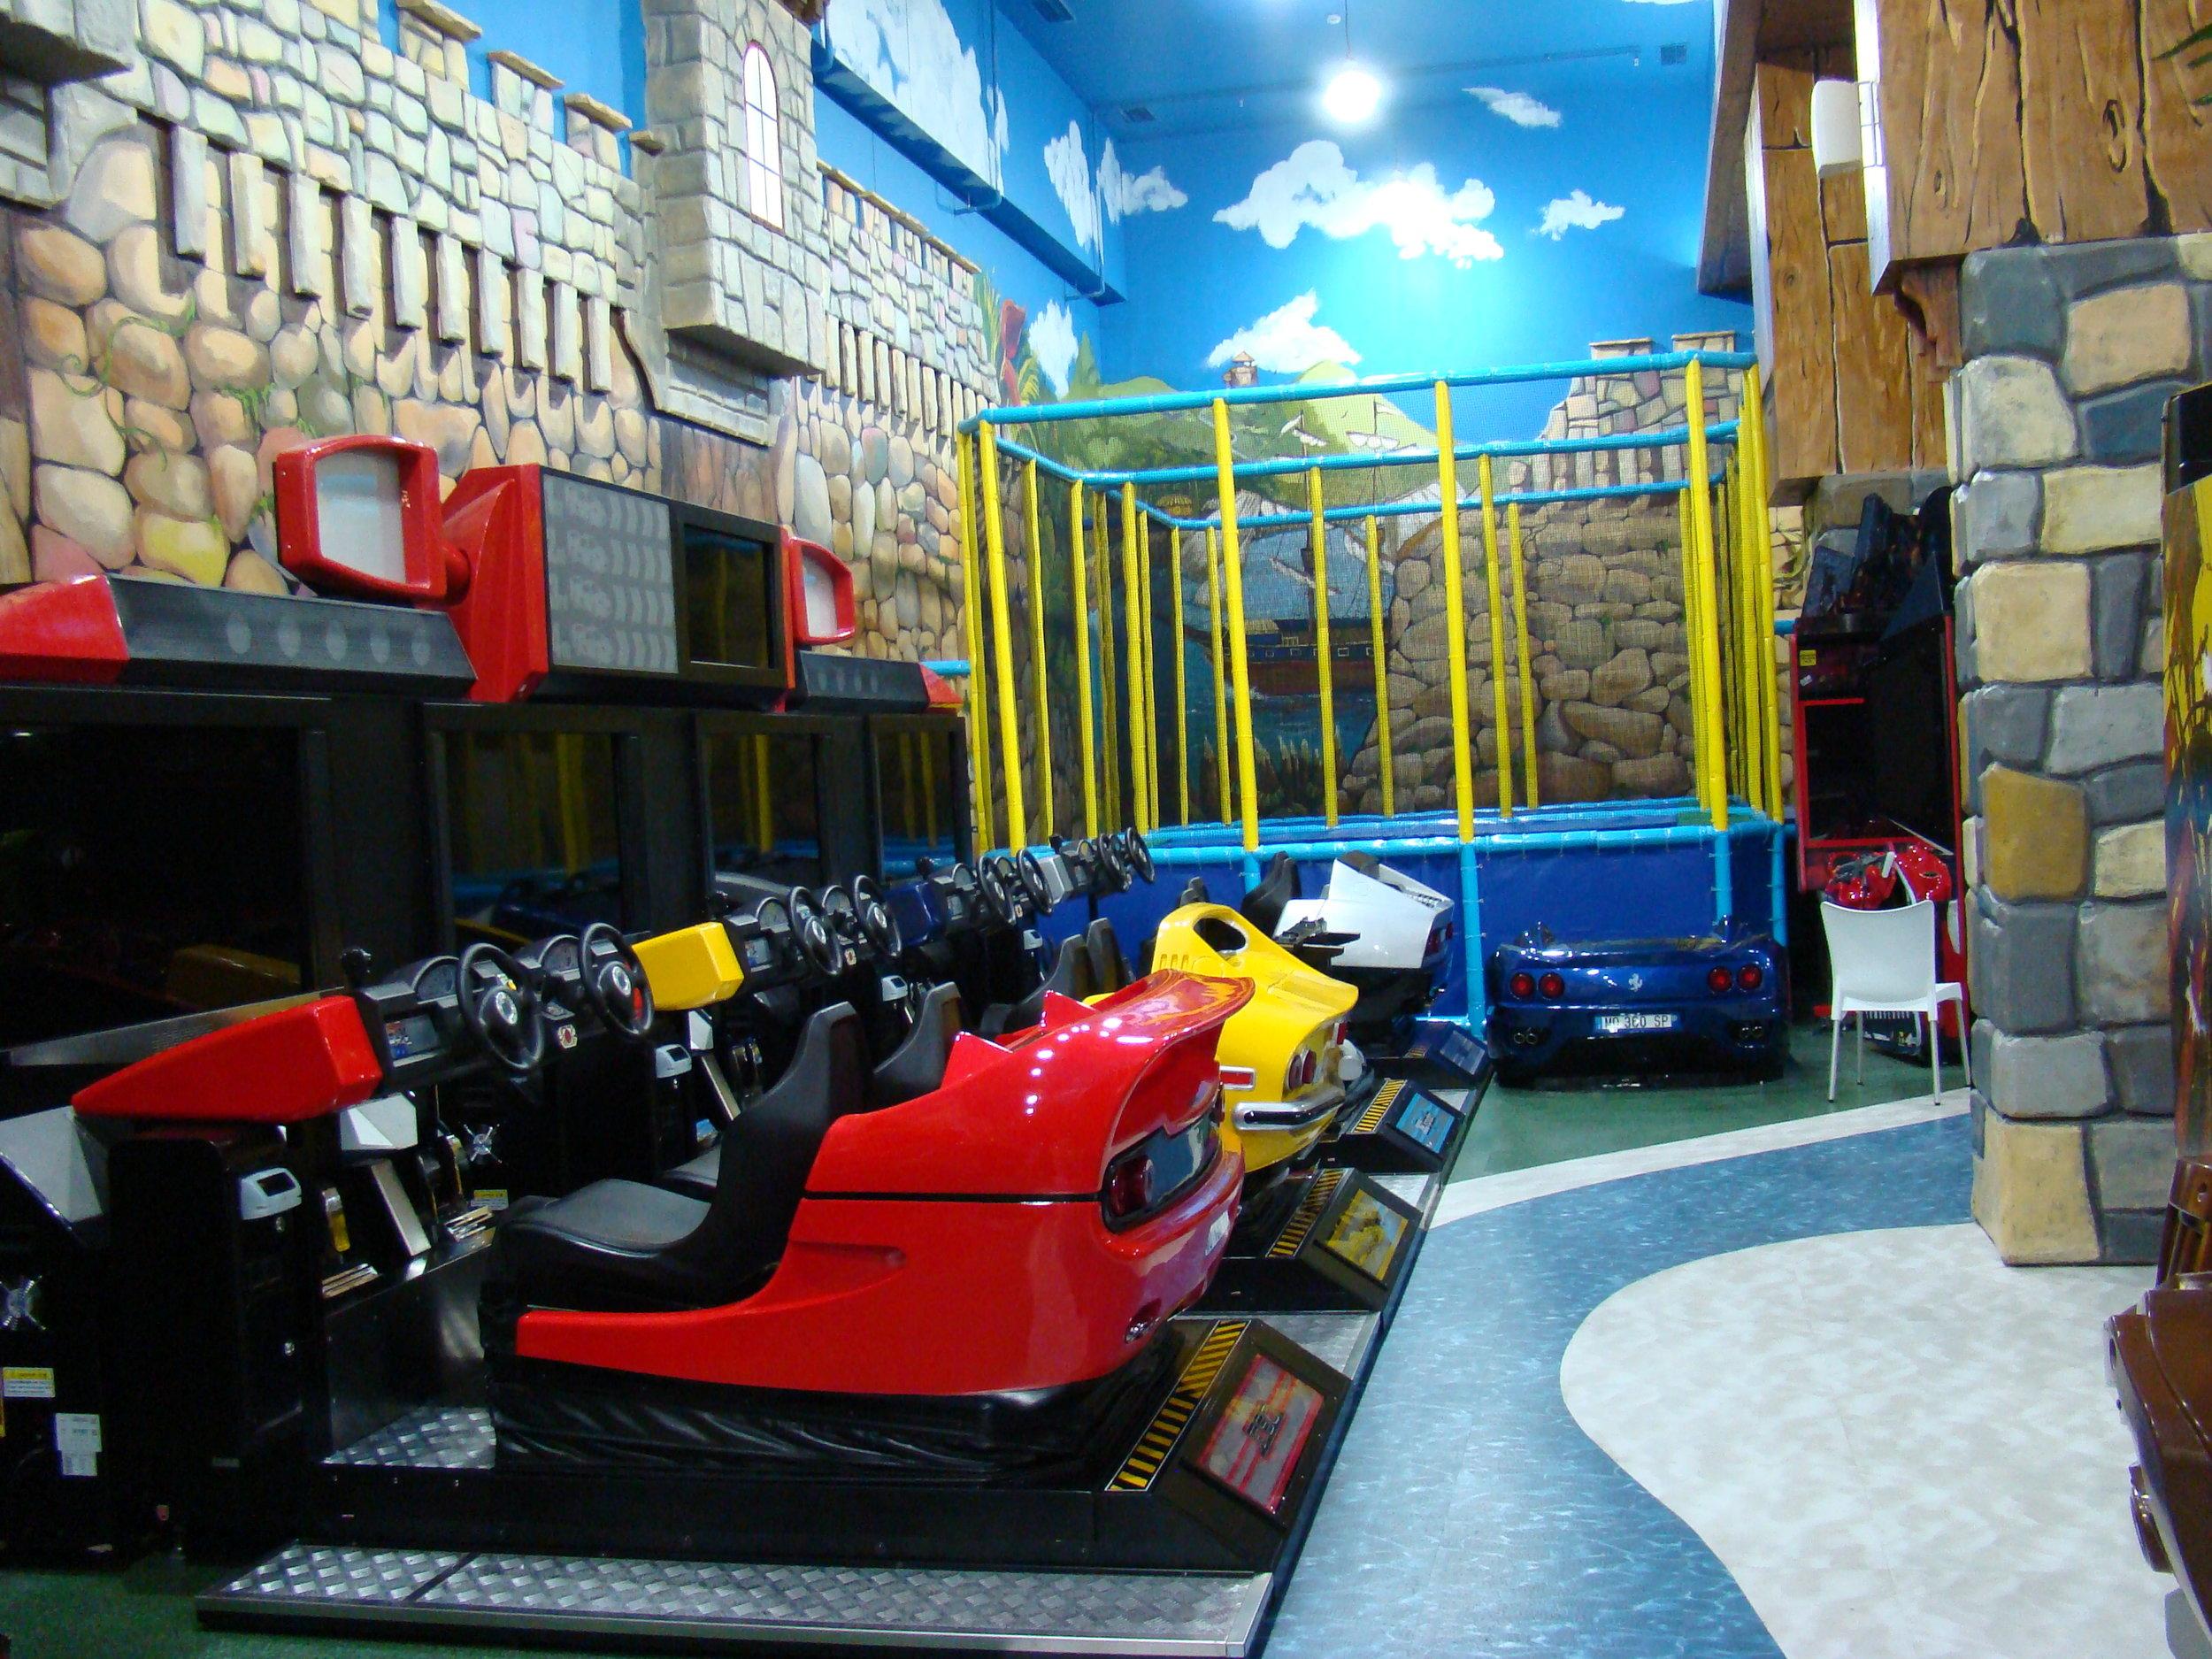 Indoor Playground Business Plan, Edutainment, Family Entertainment, FEC Development